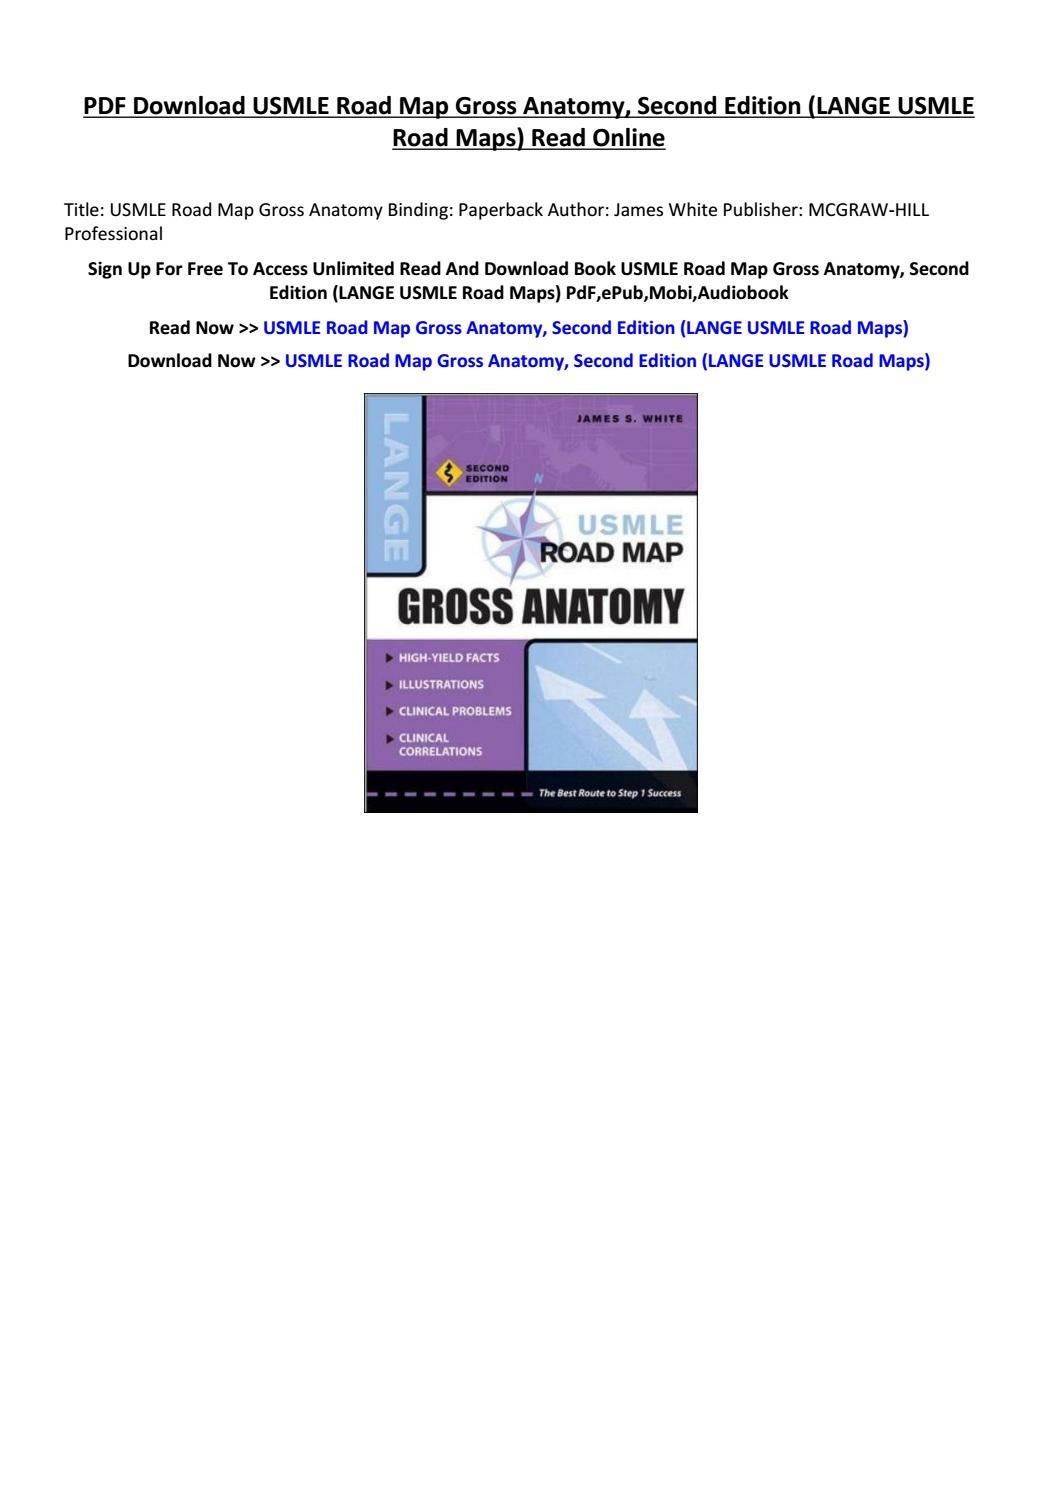 Usmle Road Map Gross Anatomy By Mkiytredw Issuu